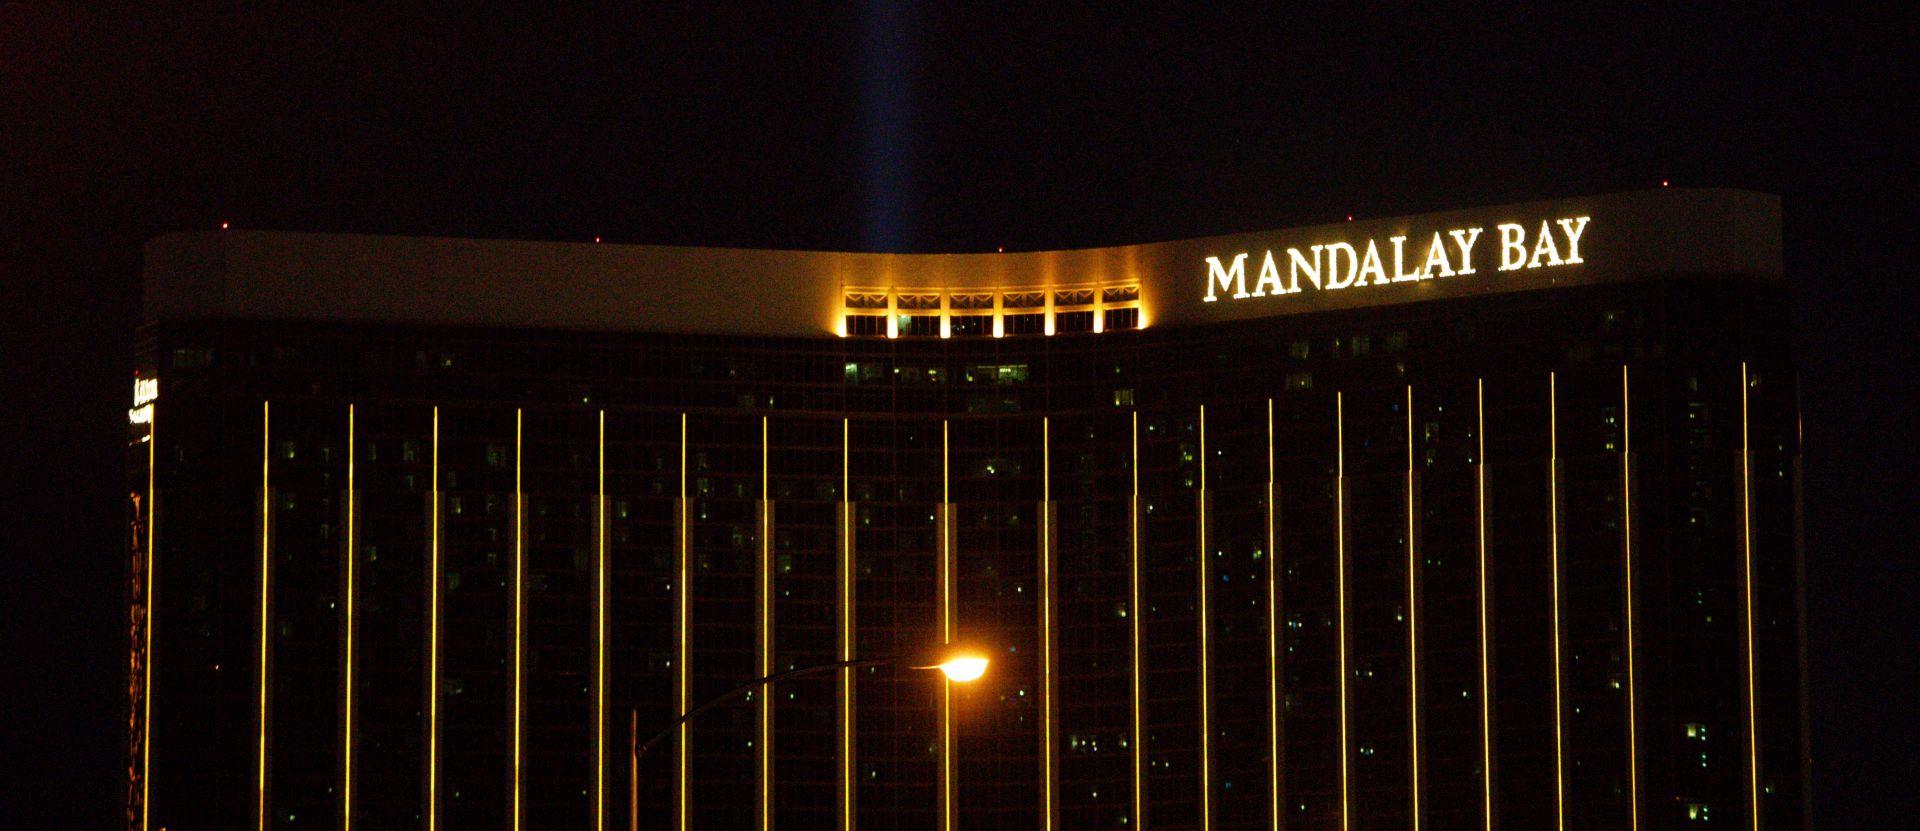 Istraga protiv napadača iz Las Vegasa okrenula se njegovoj partnerici